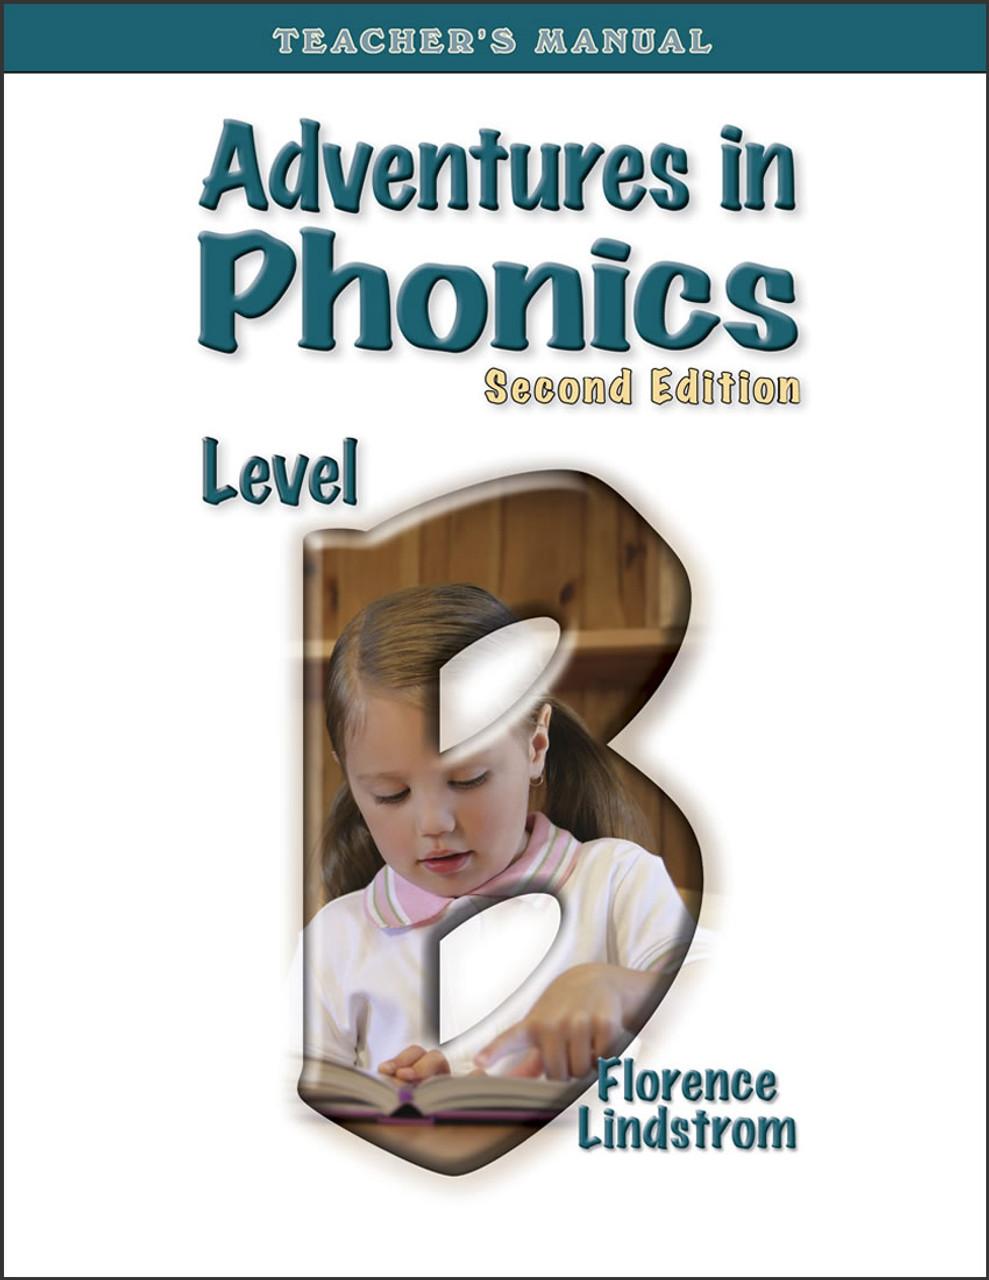 Adventures in Phonics: Level B, 2nd edition - Teacher's Manual